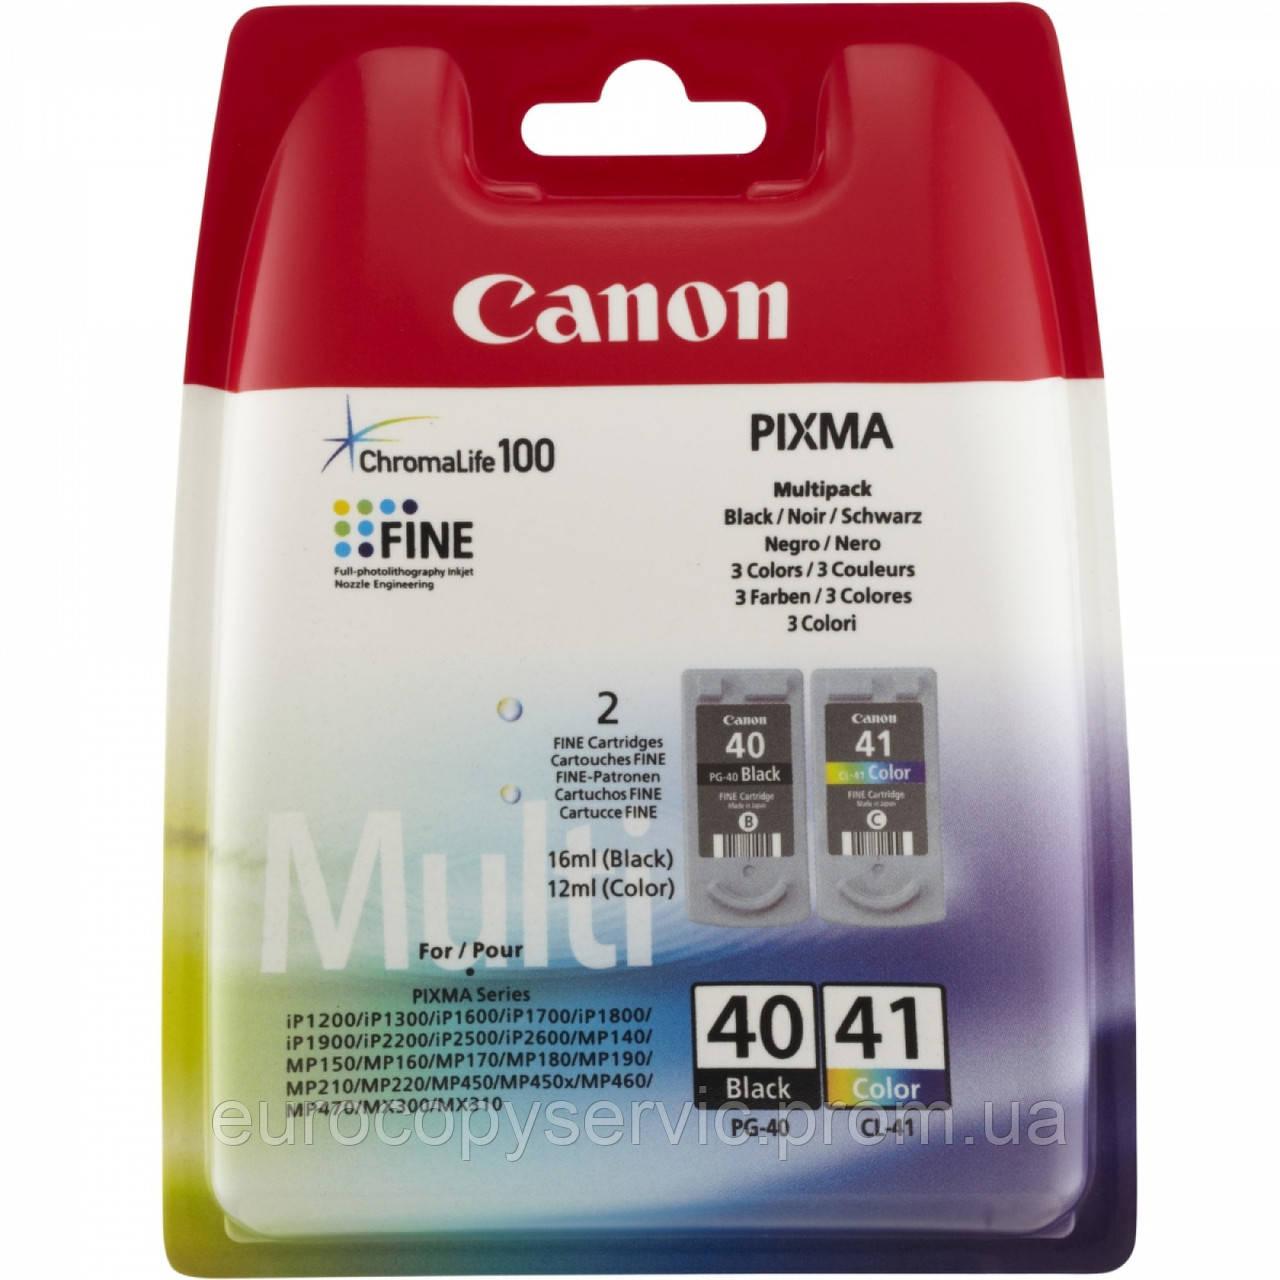 Набір картриджів Canon PG40 + CL41 PG40 + CL41 MultiPack (0615B043)